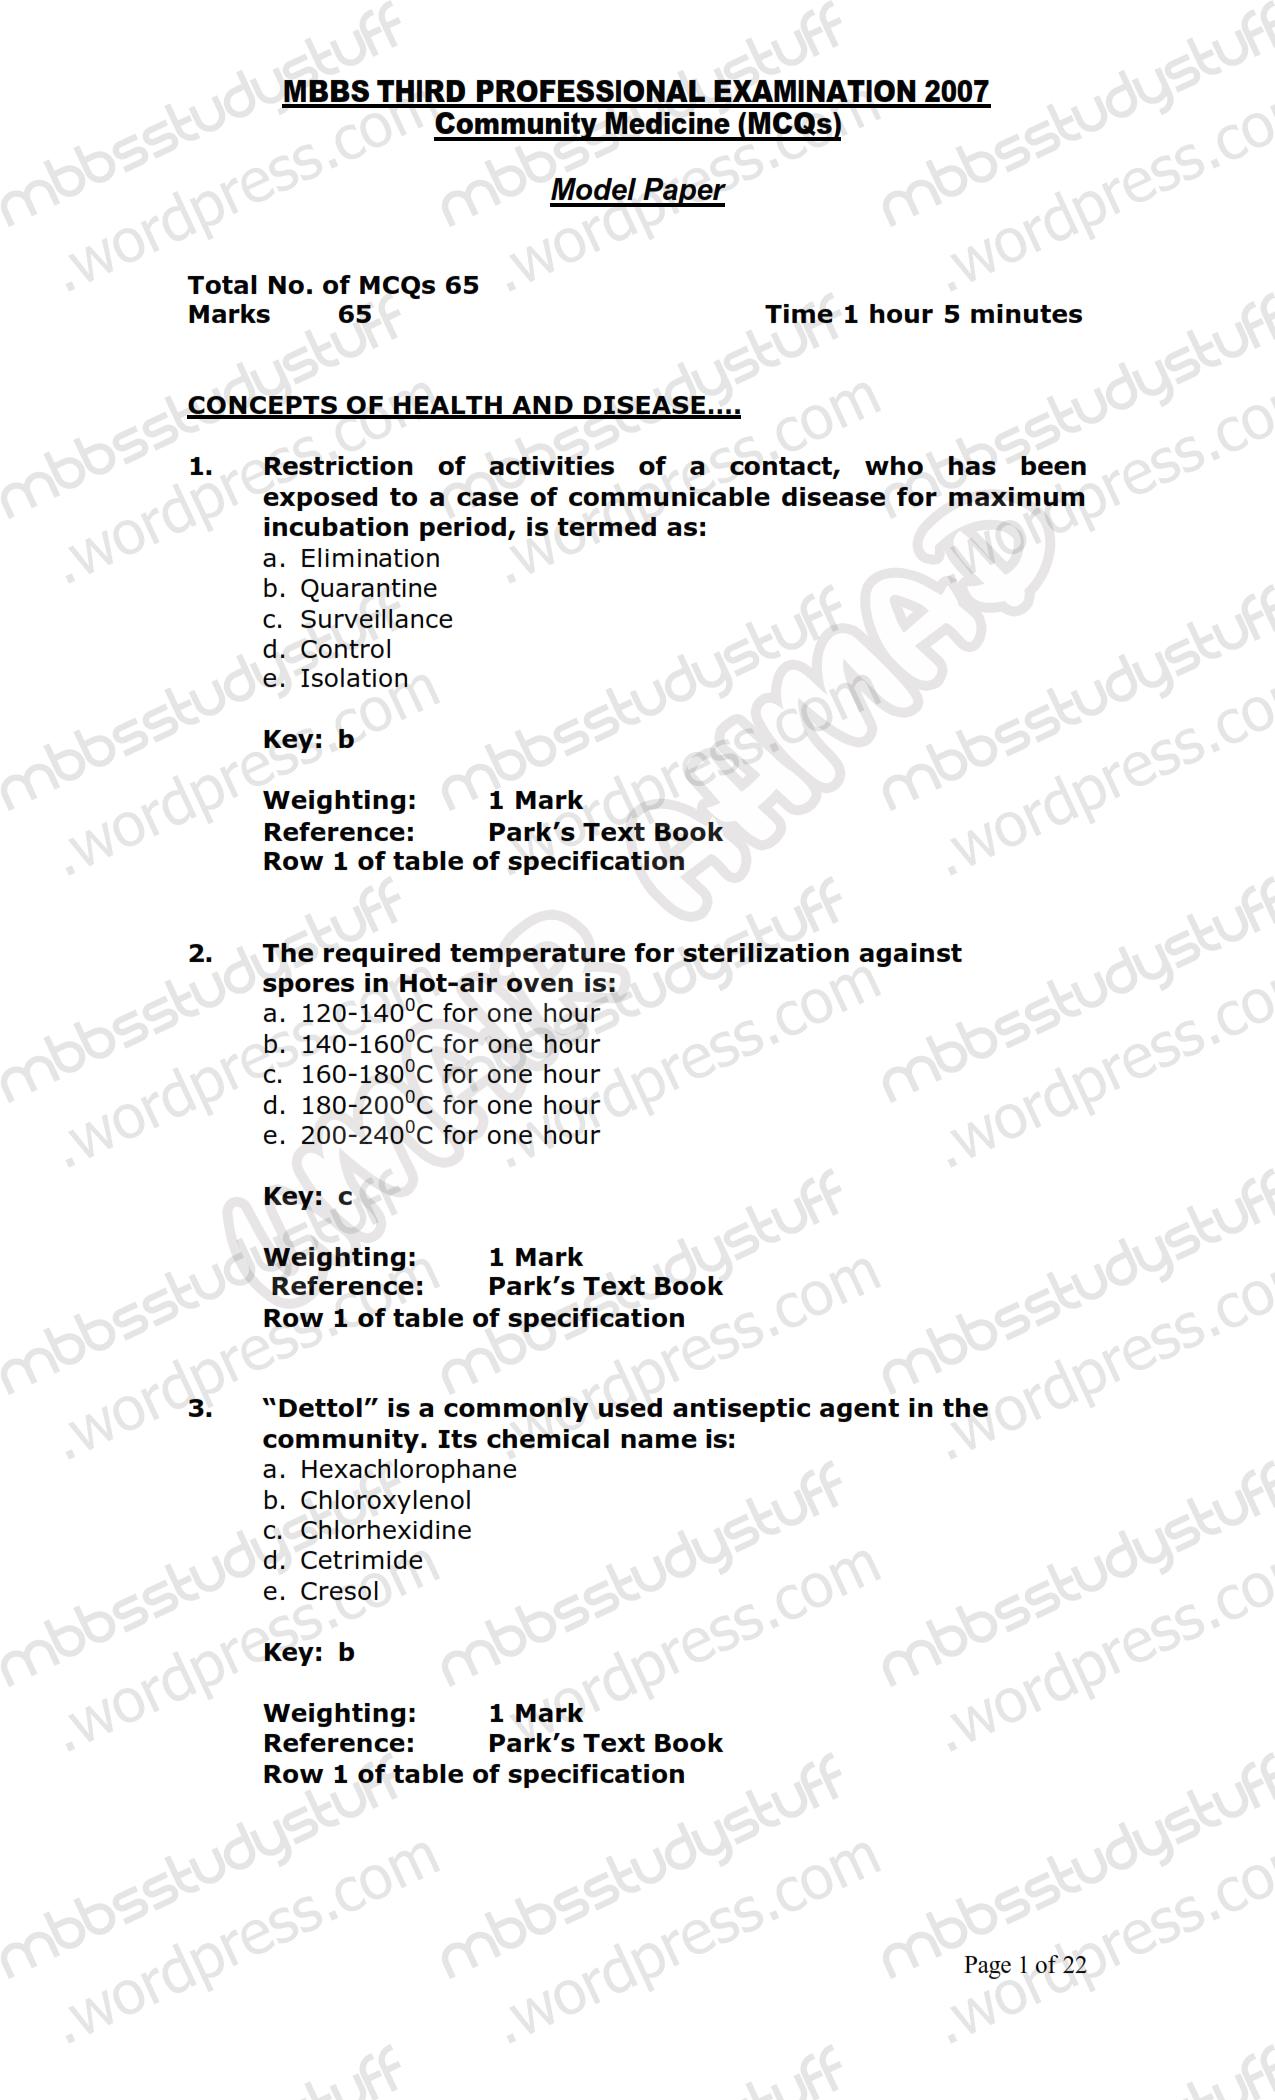 COMMUNITY MEDICINE MCQ MODEL PAPER 2007 | MBBS Study Stuff